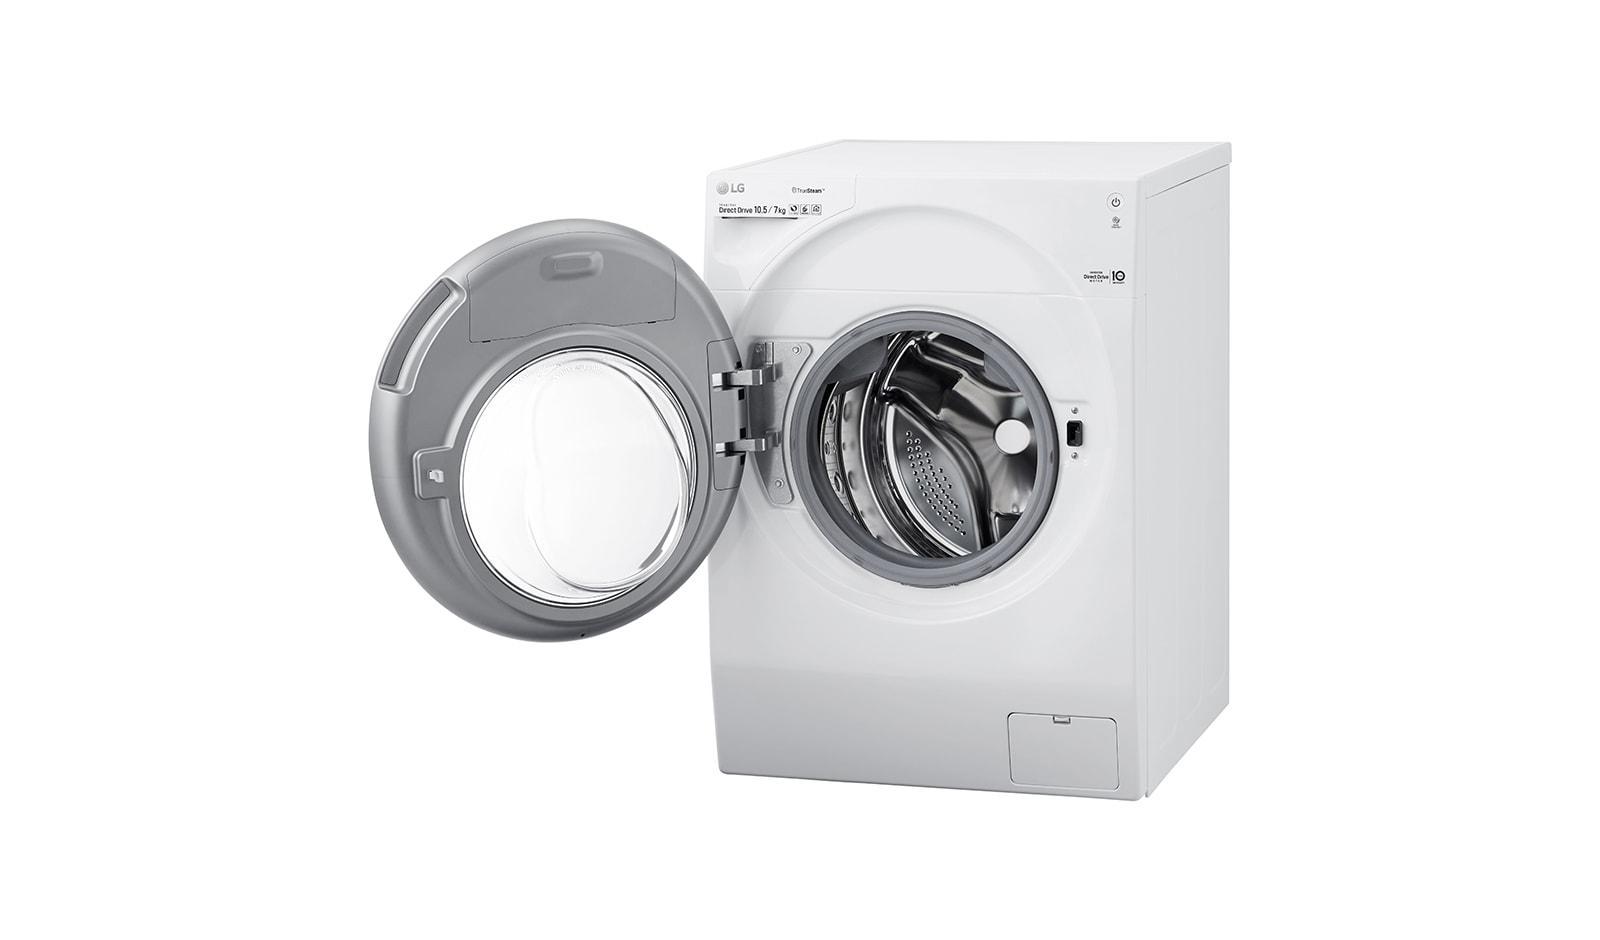 http://www.lg.com/ru/images/washing-machines/md05904556/gallery/large_06.jpg